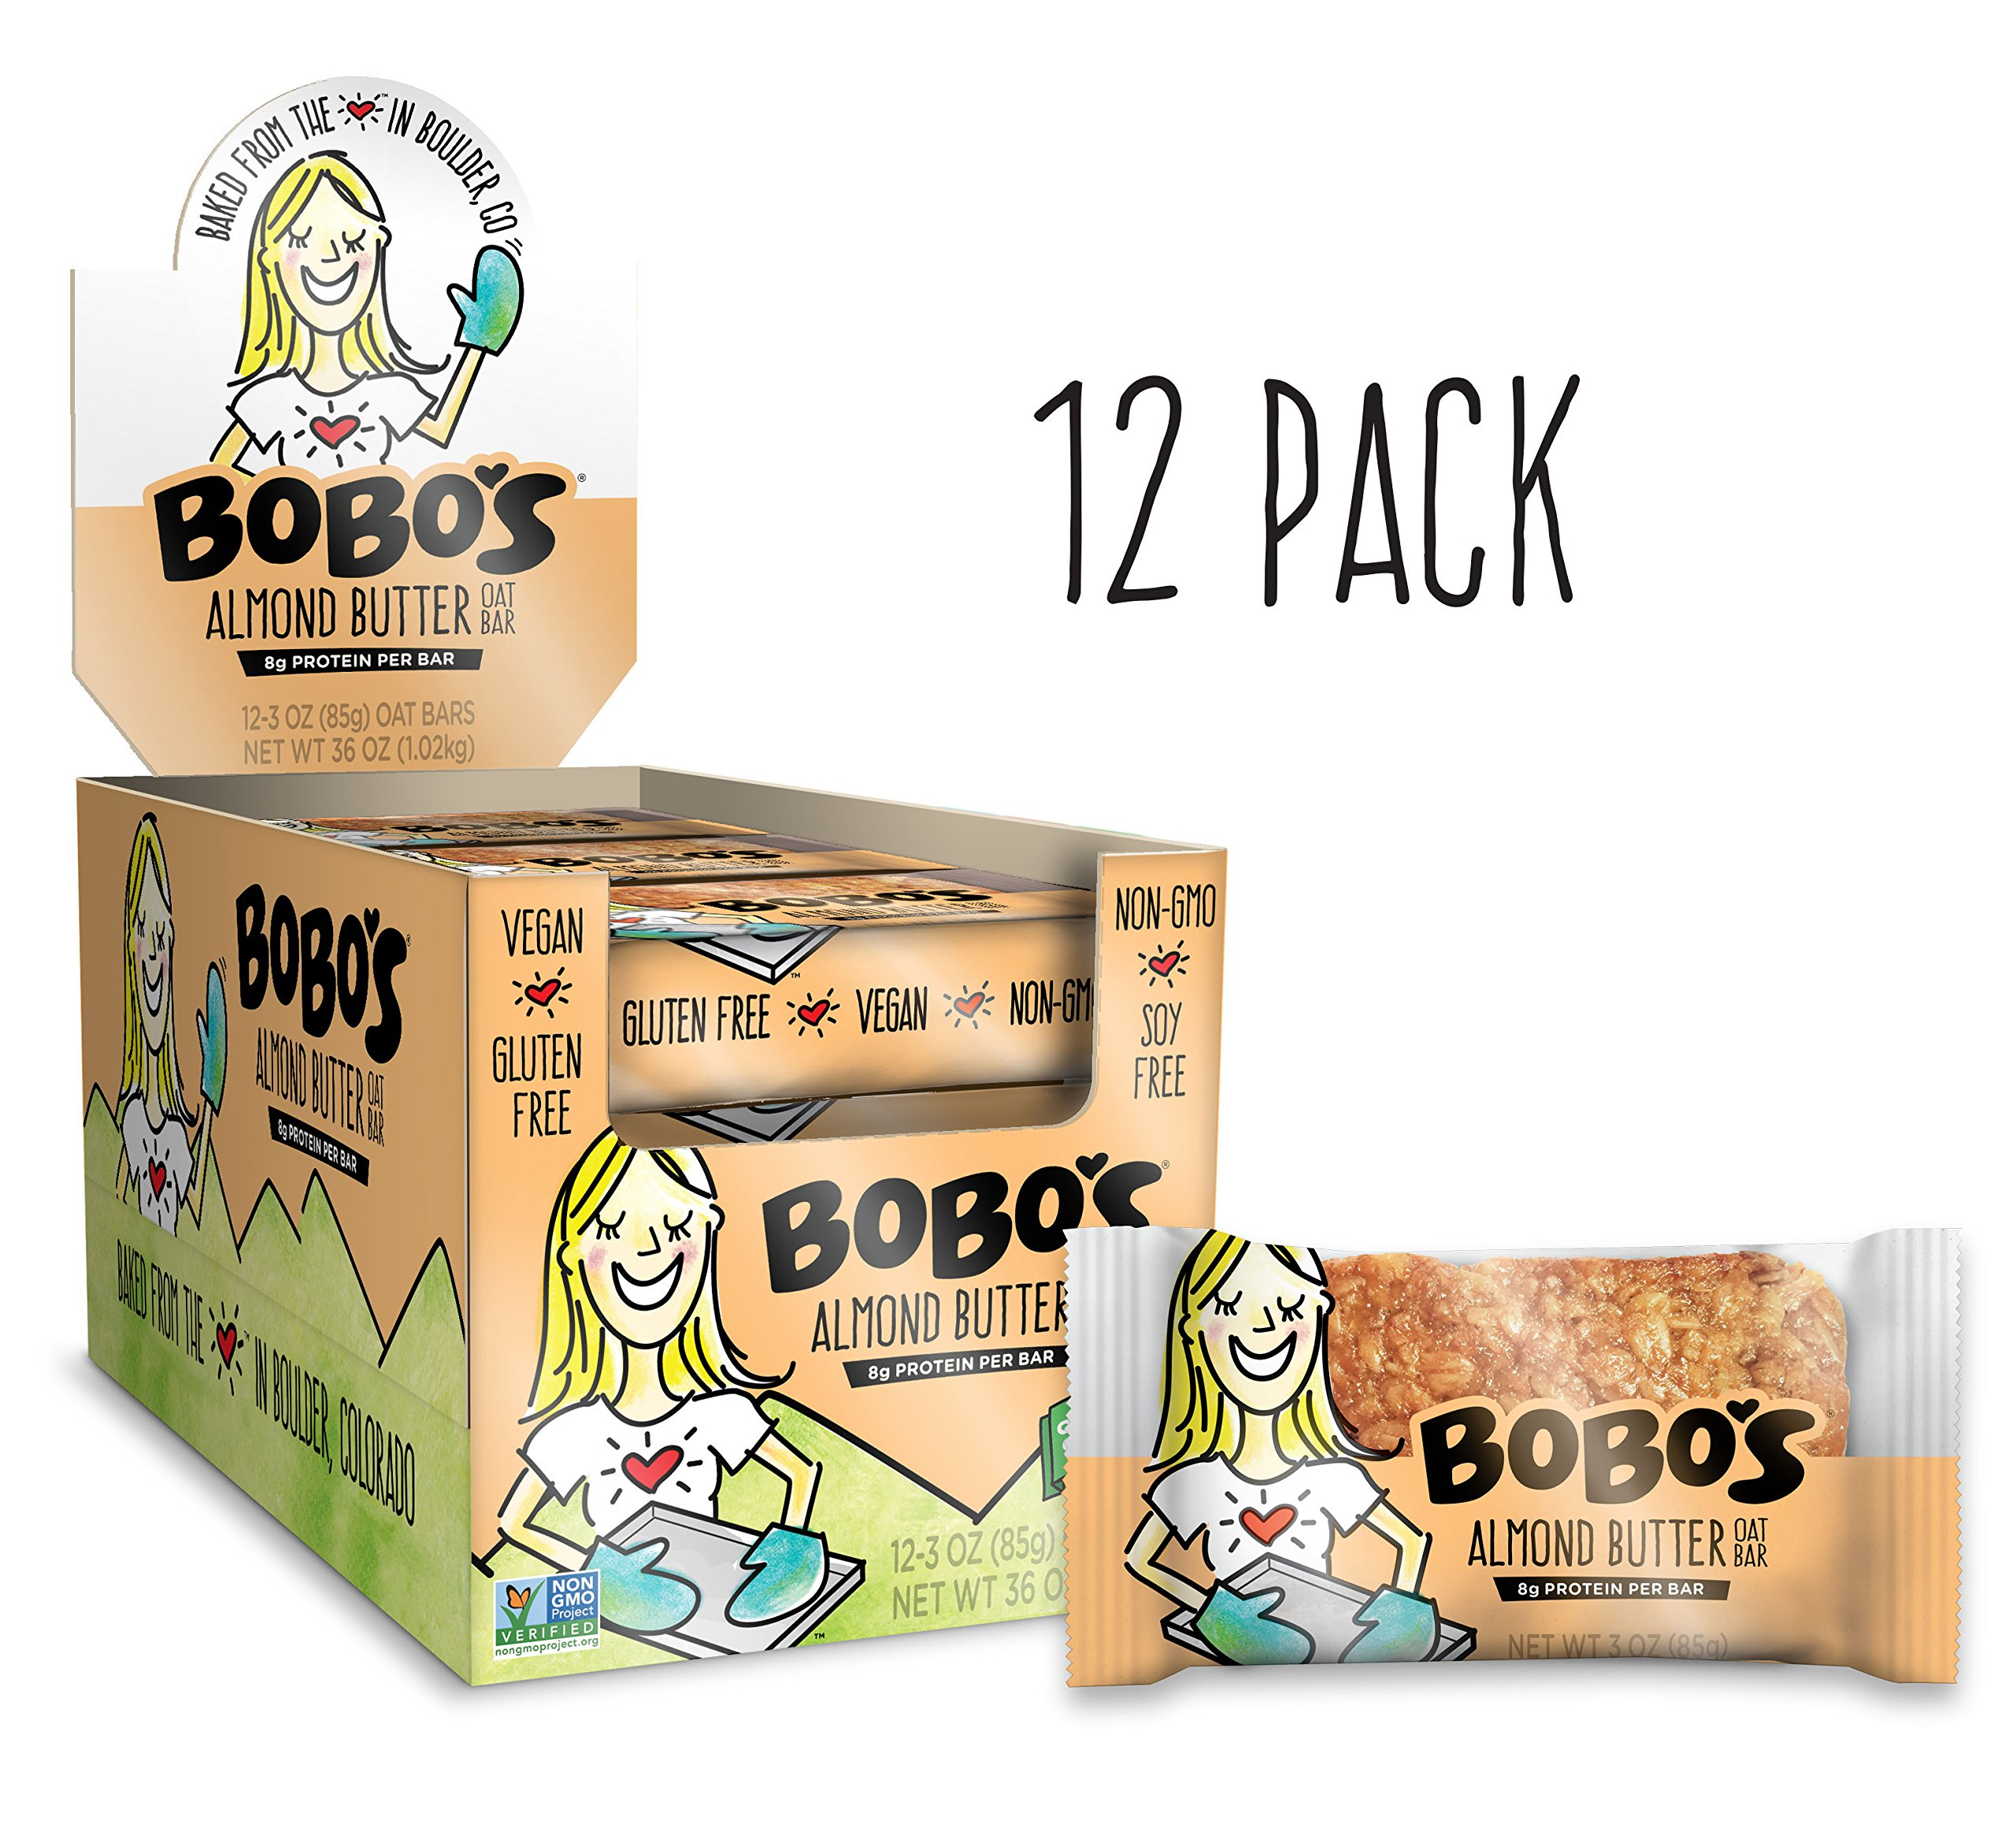 Bobo's Oat Bars, Almond Butter, 3 oz Bar (12 Pack), Gluten Free Whole Grain Snack and Breakfast Bar by Bobo's Oat Bars